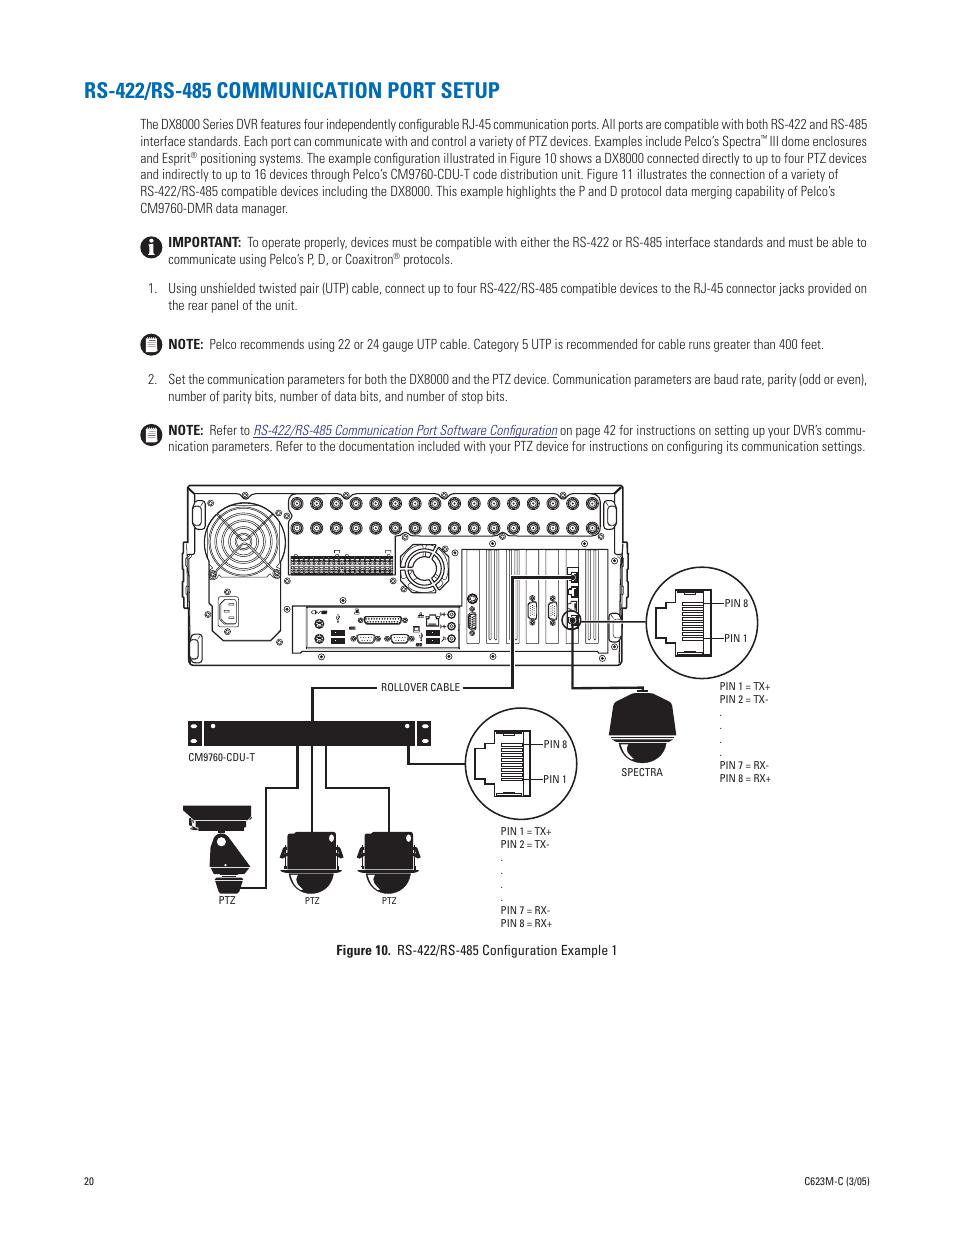 medium resolution of pelco rs485 ptz wiring diagram wiring diagram schemapelco wiring diagram wiring diagram schema pelco rs485 ptz